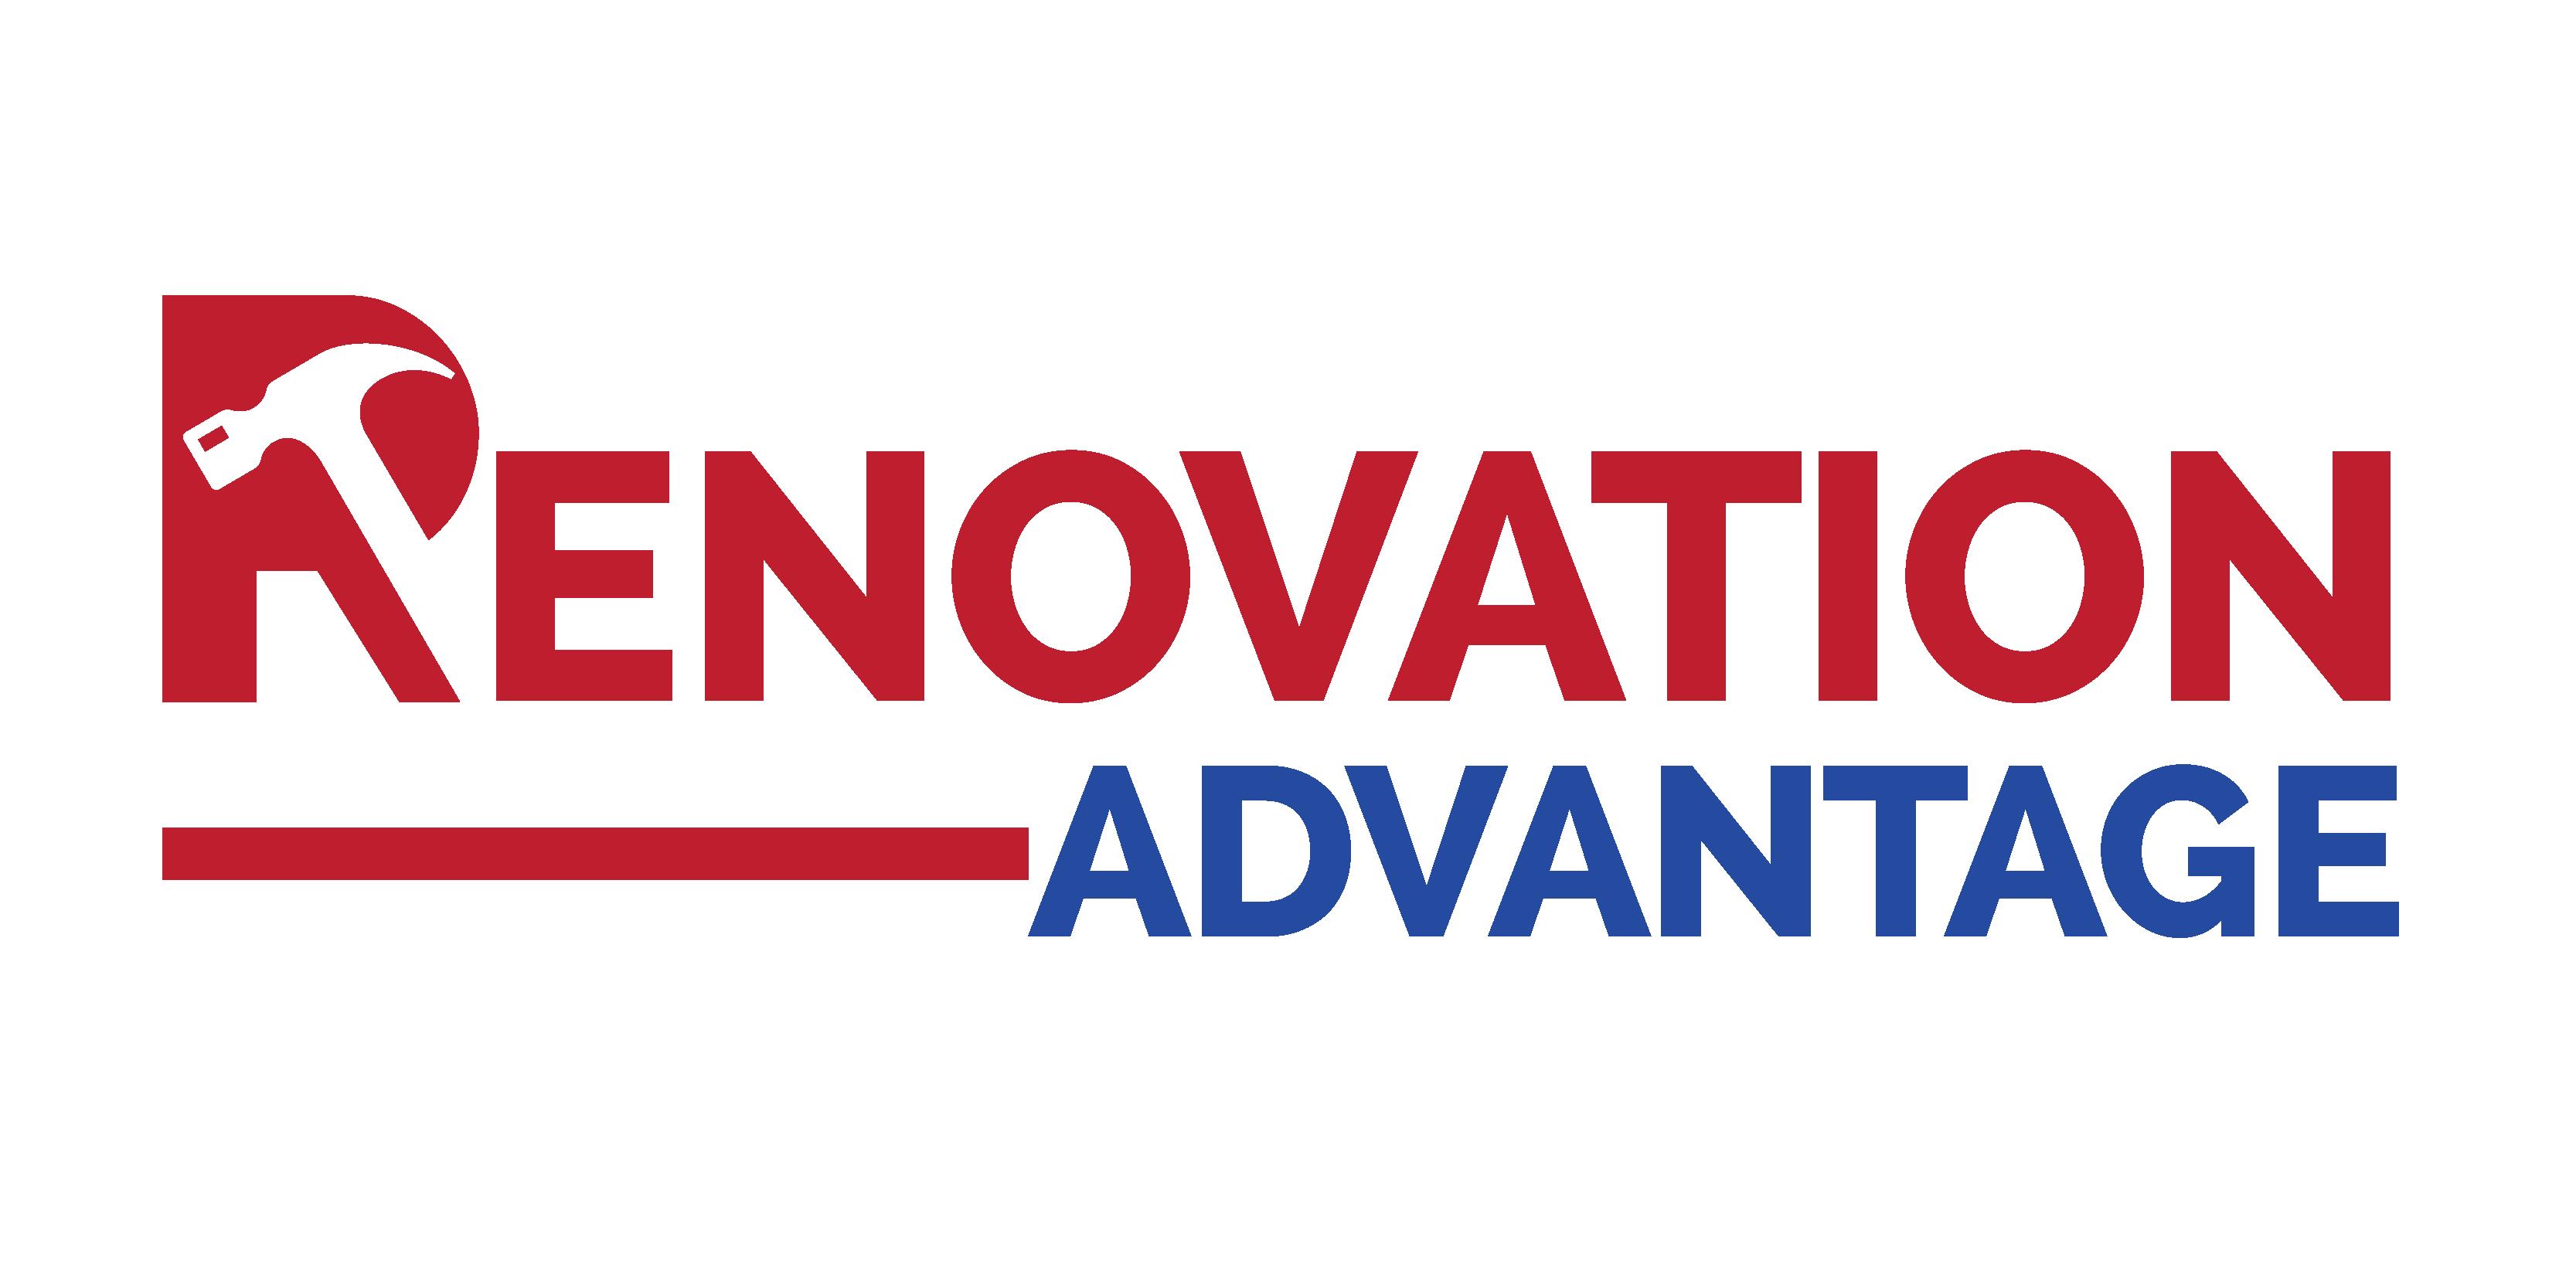 Renovation-Advantage-01.png